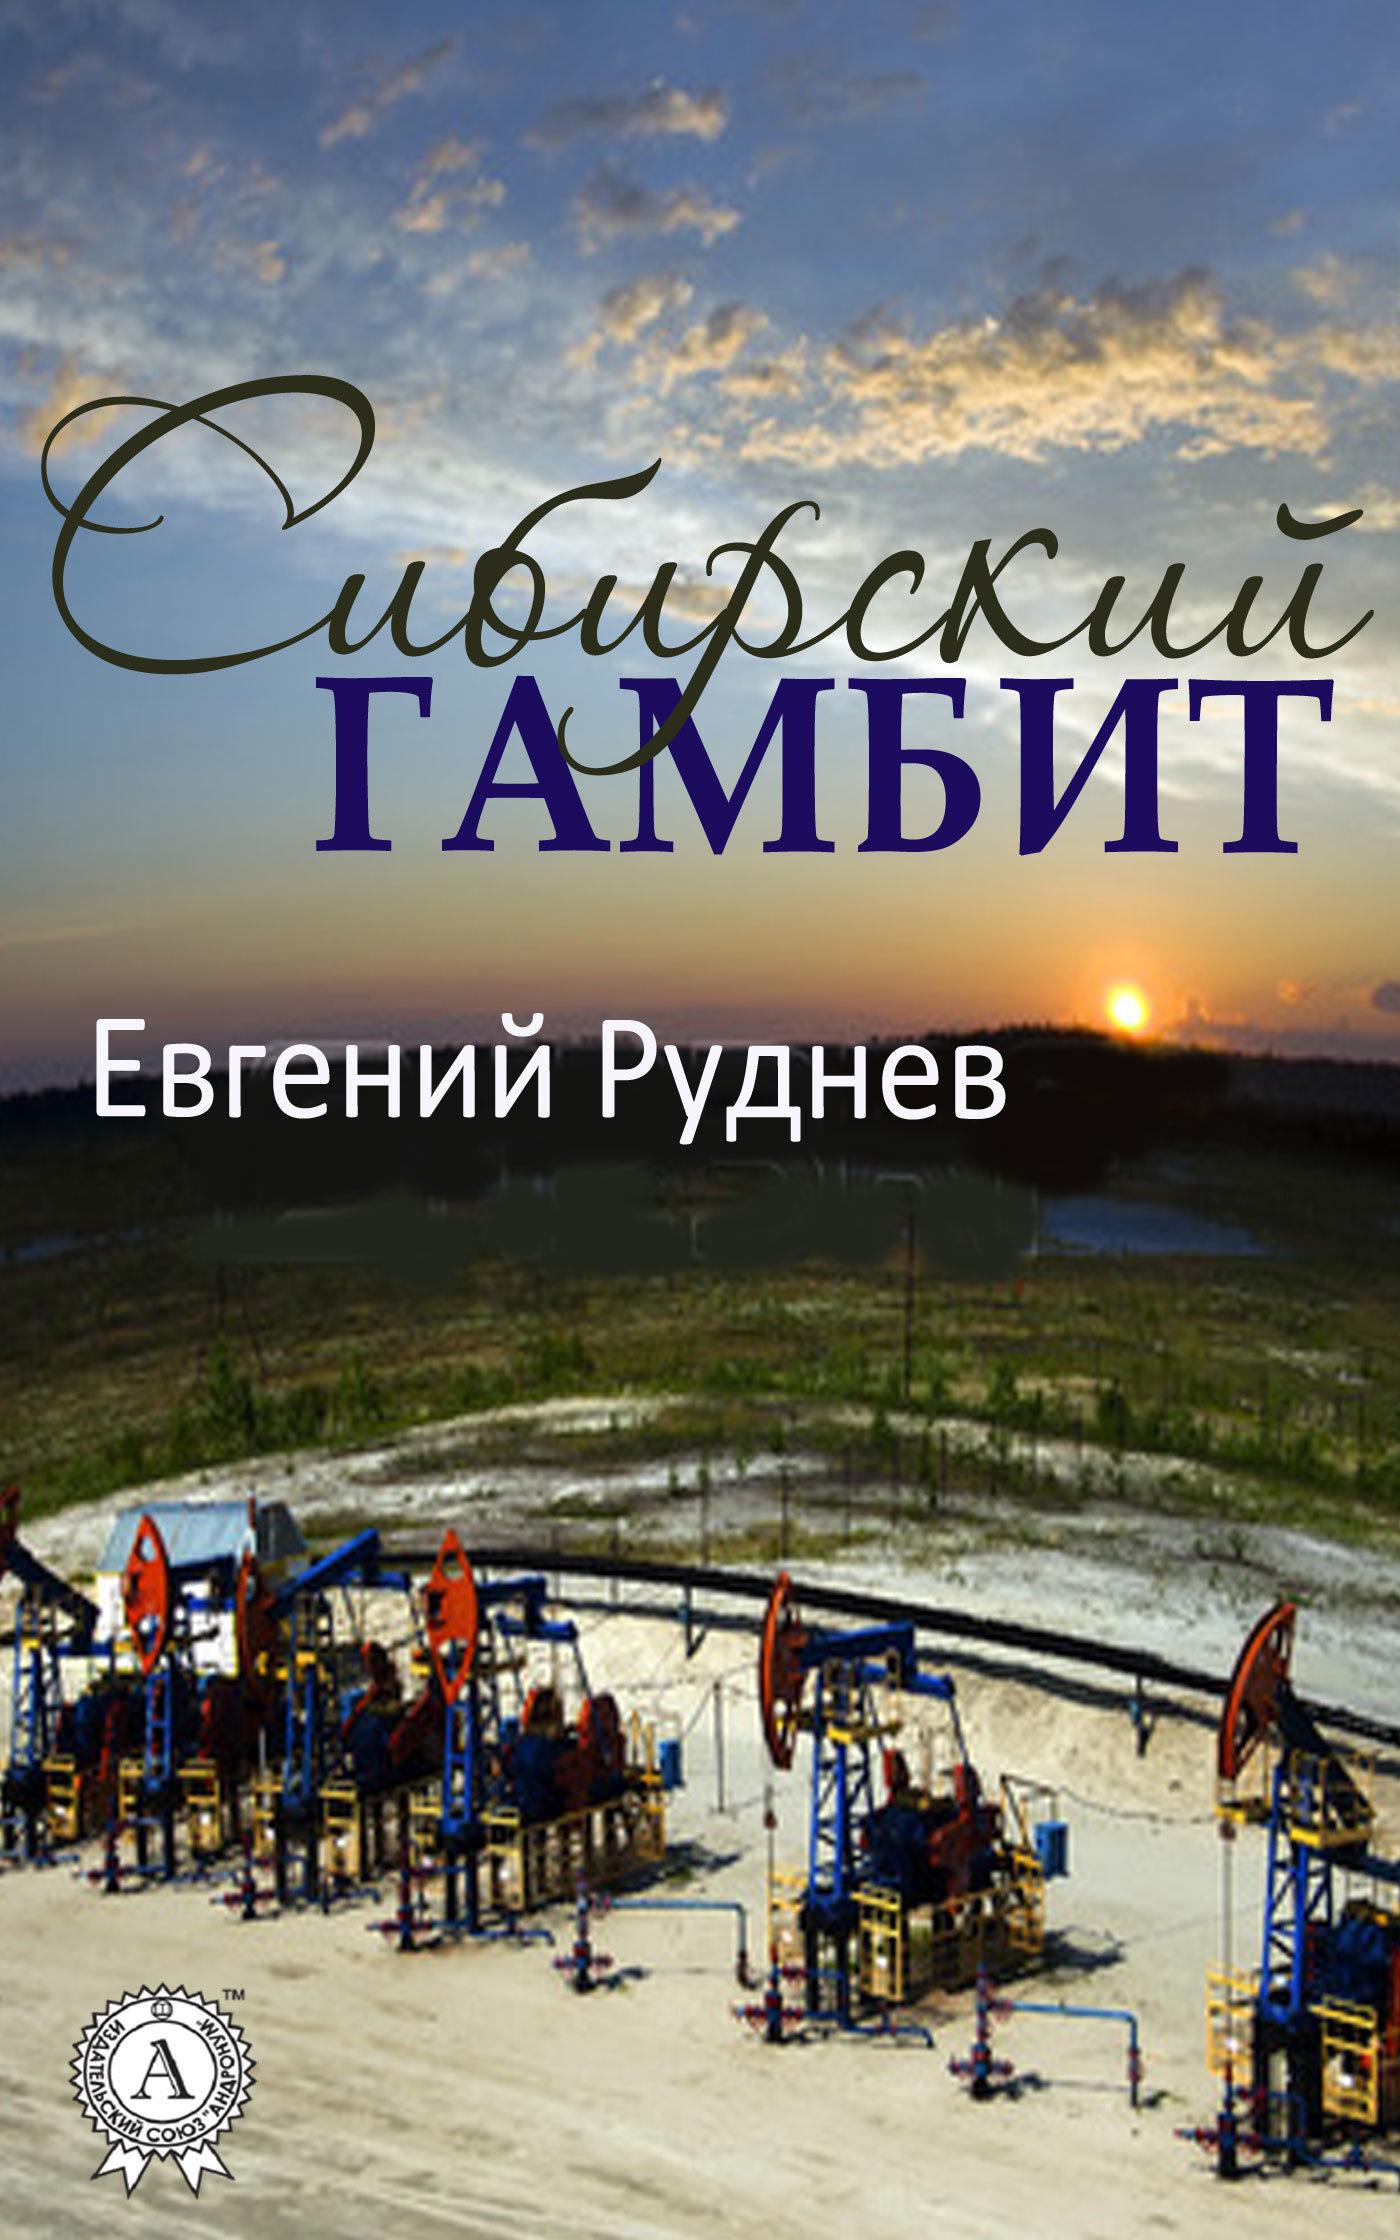 Евгений Руднев Сибирский гамбит